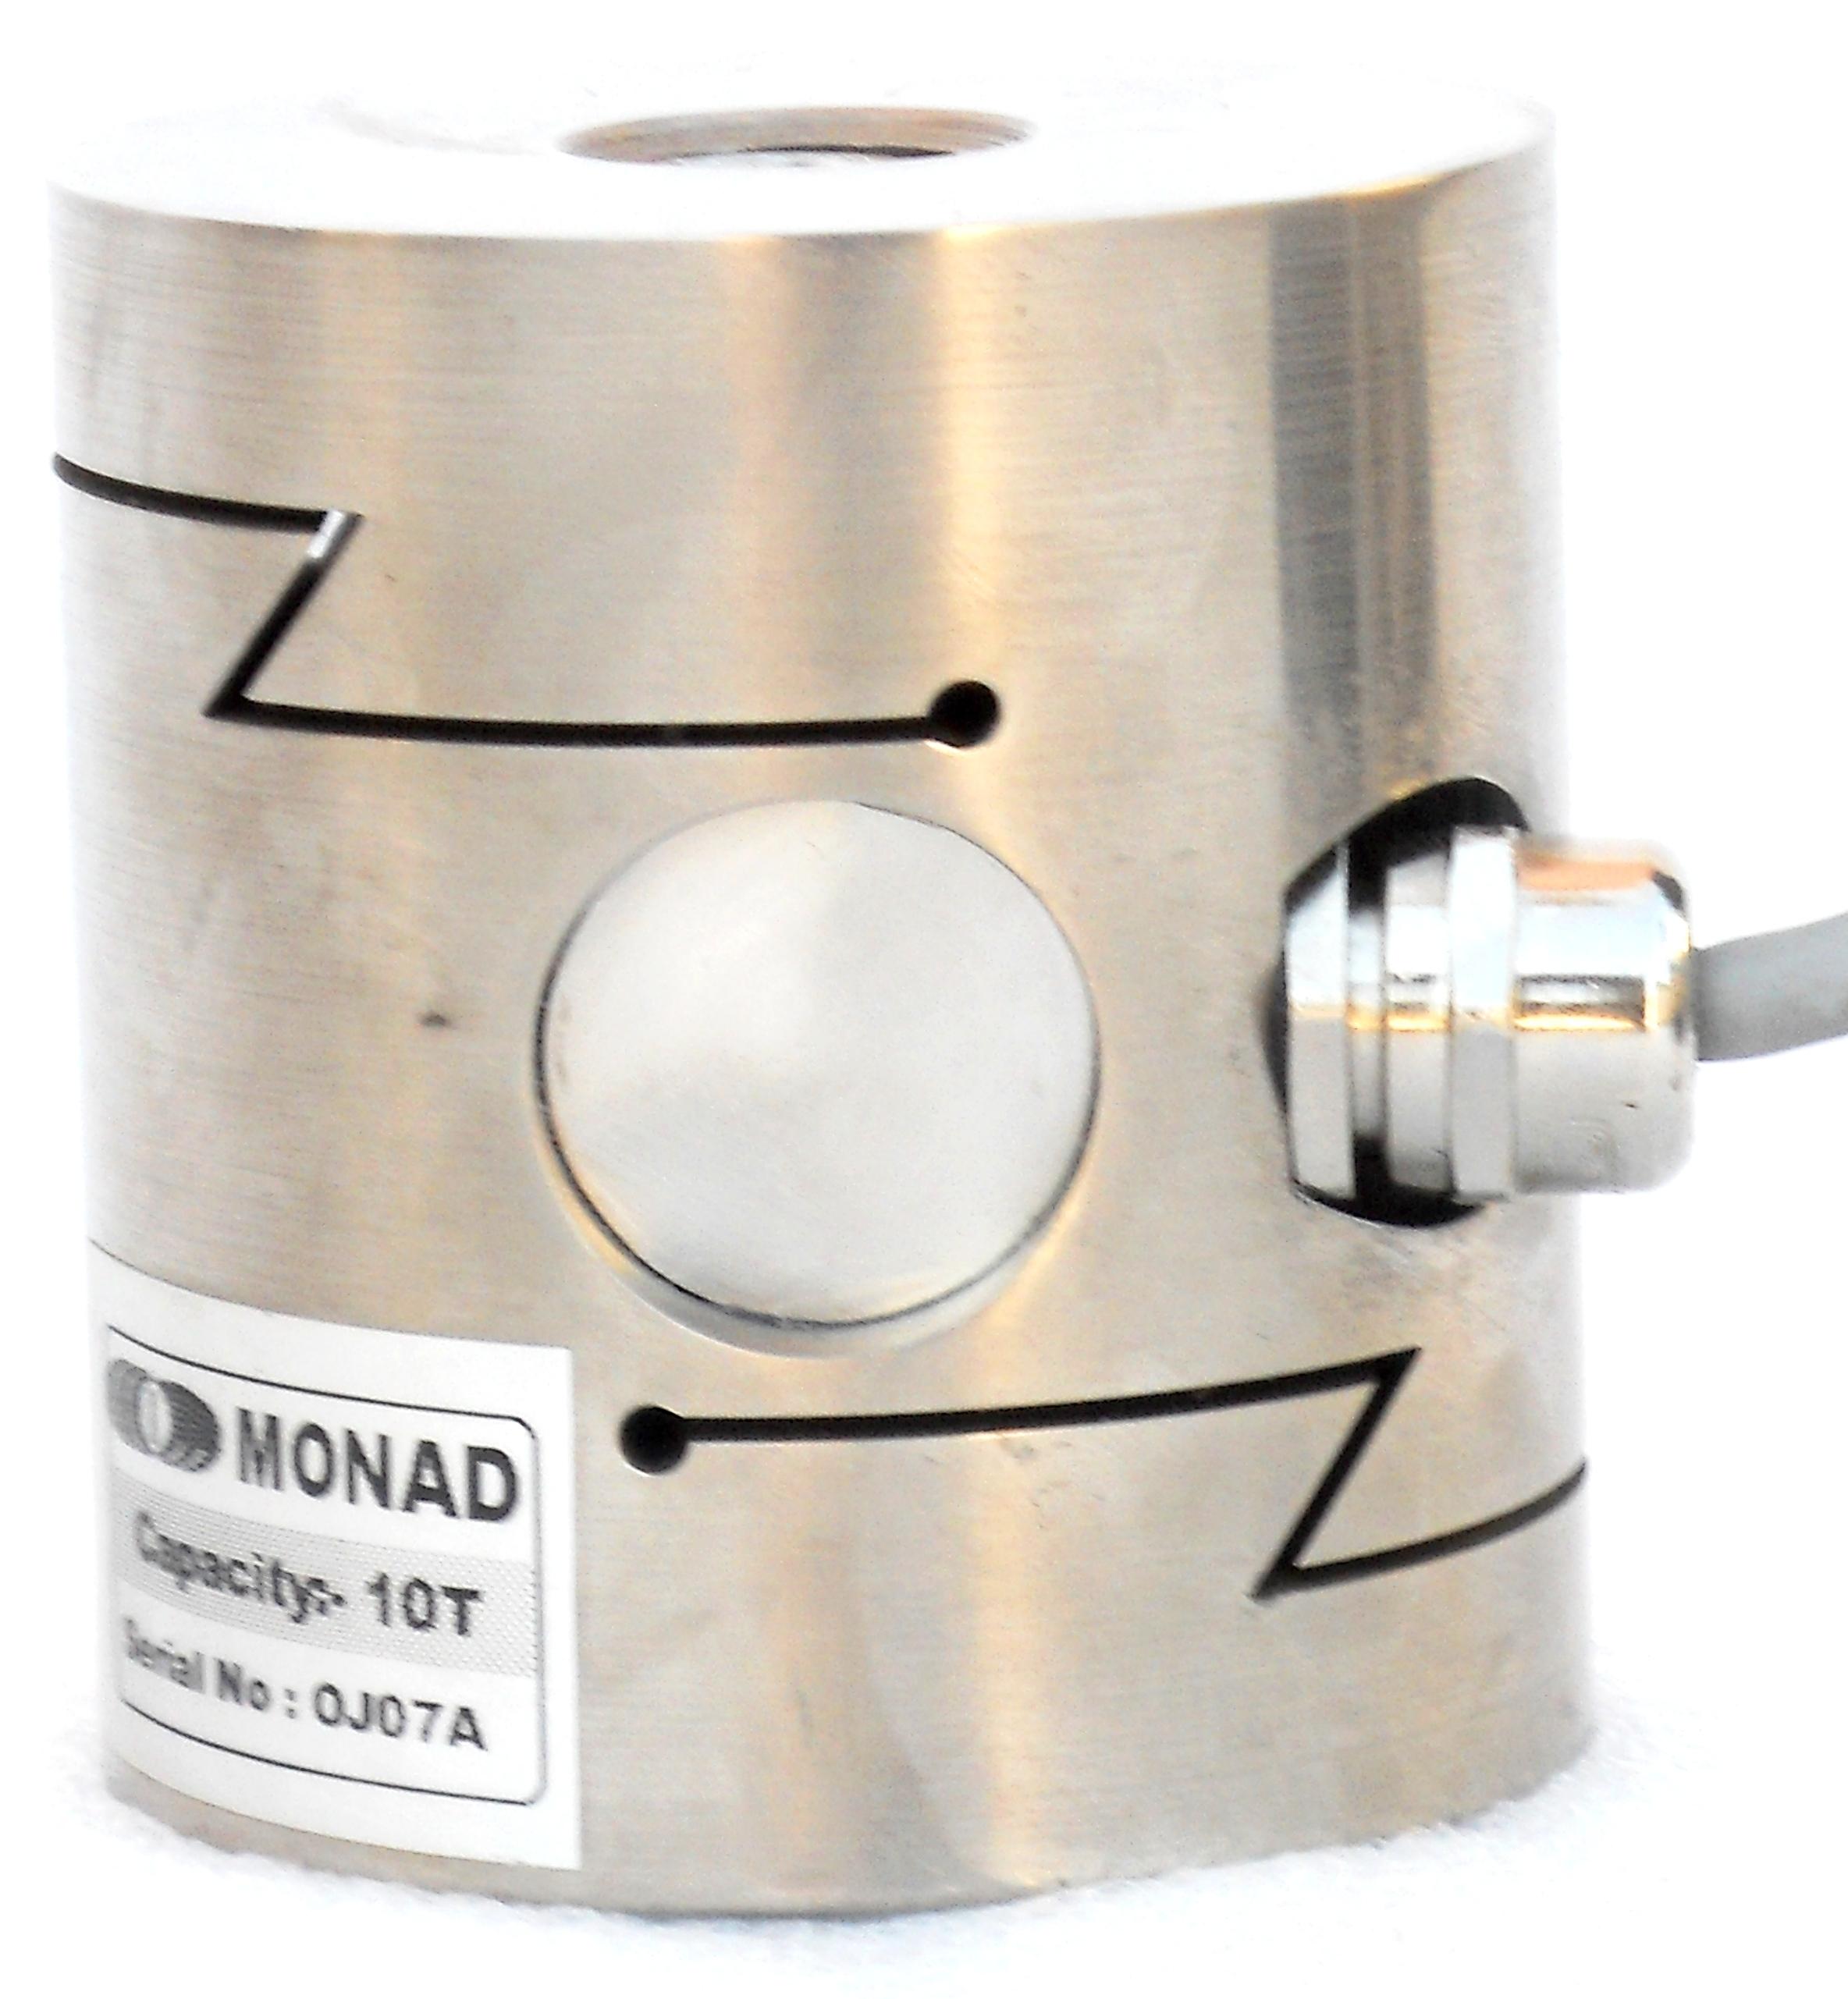 Load Sensor/ Force Sensor/ Weight Sensor